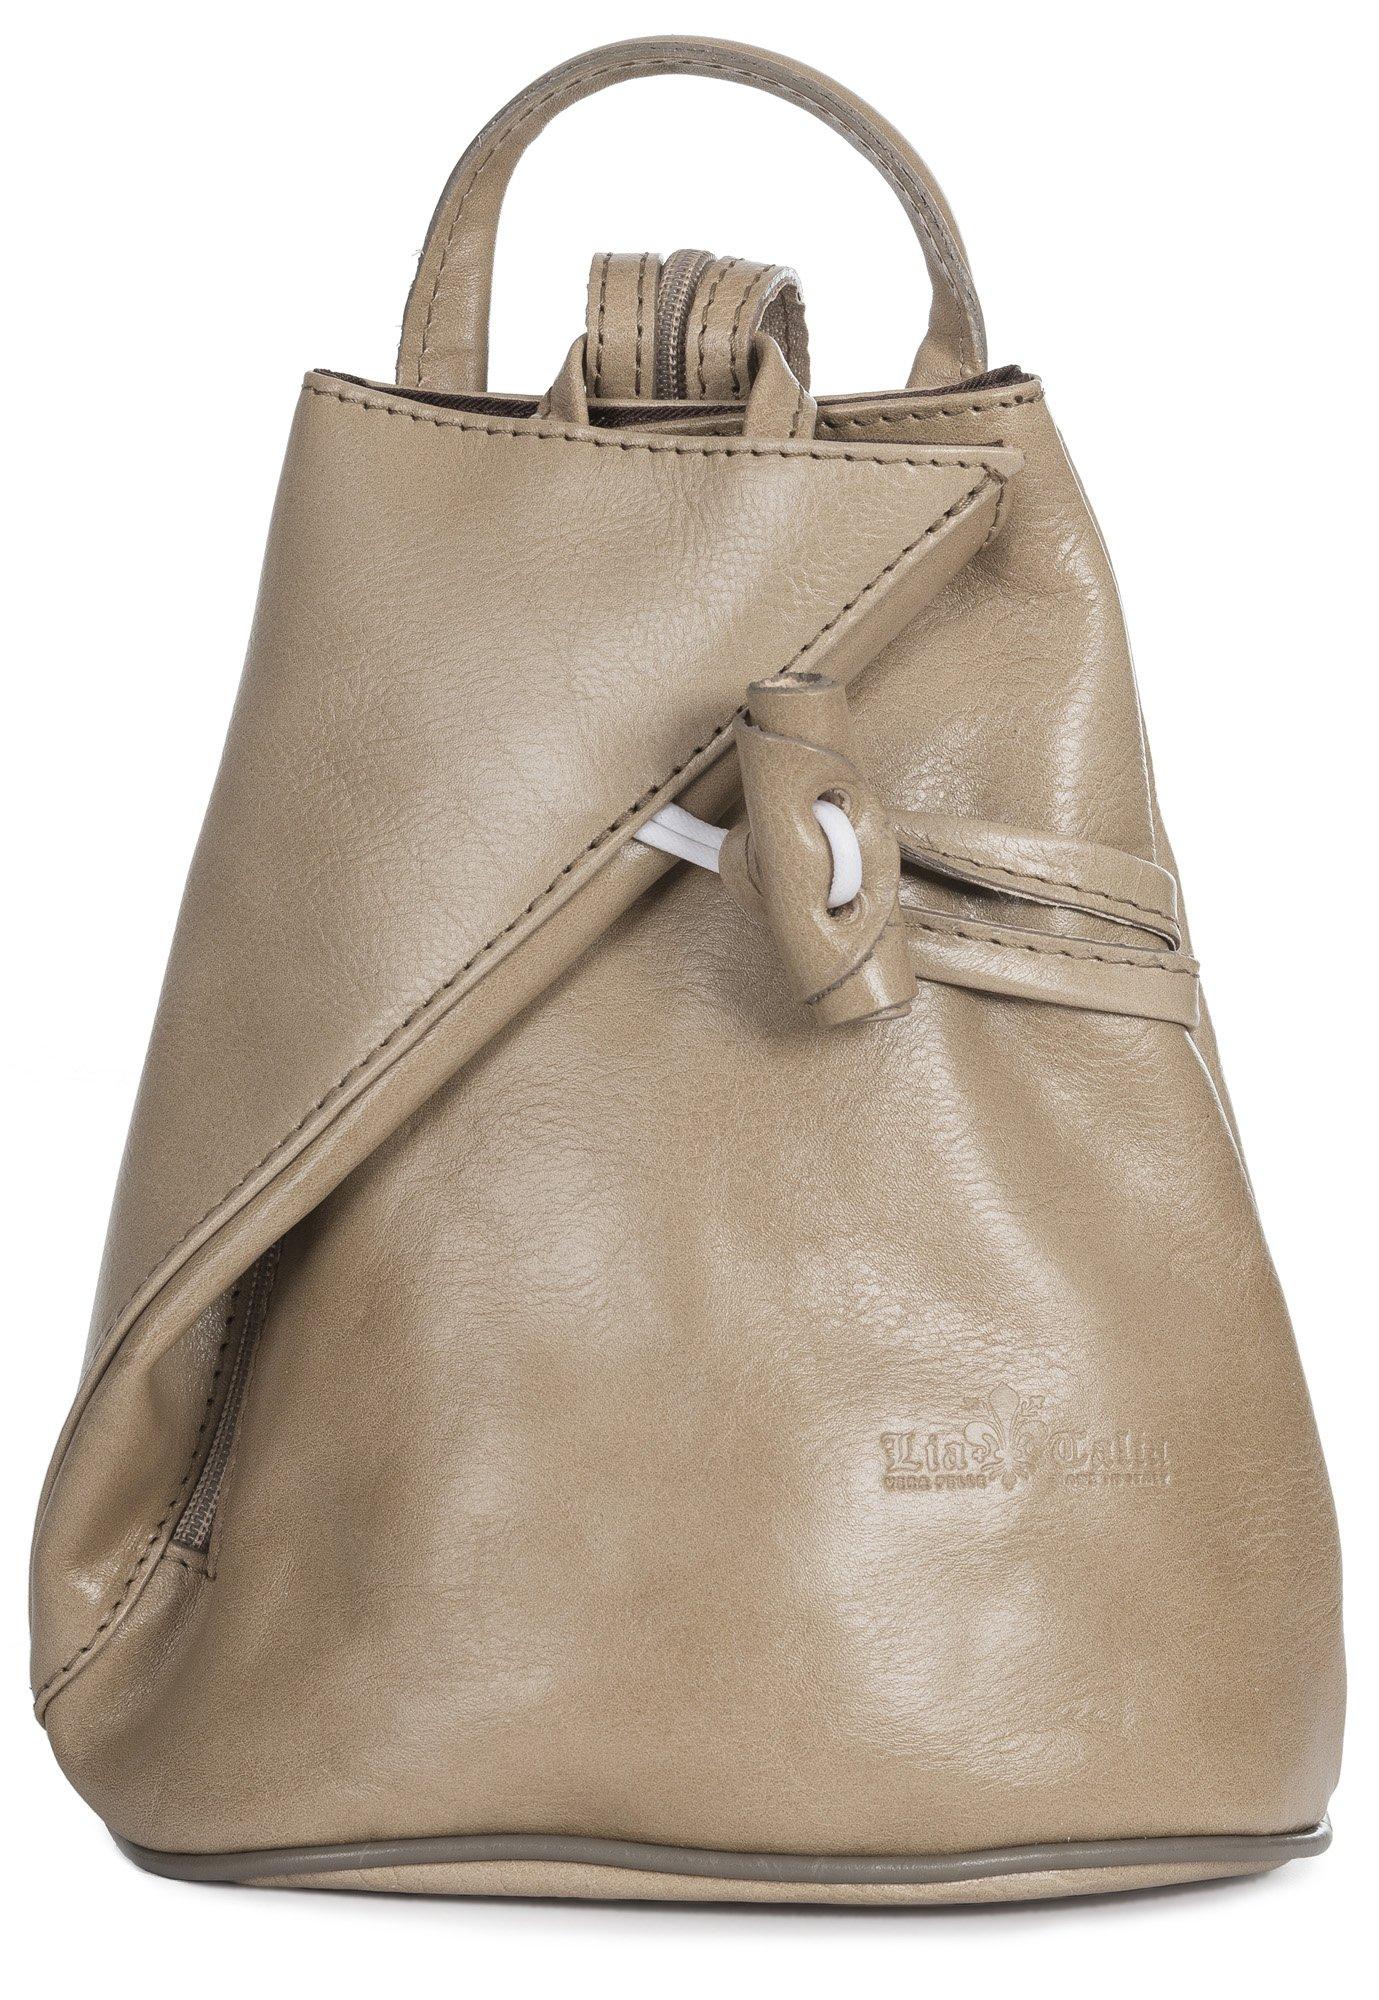 LiaTalia Vera Pelle Made In Italy Brady byLiaTalia Womens Mens Adult Convertible Strap Italian Leather Backpack Rucksack Duffle Shoulder Bag Handbag (Large/Medium - Beige Plain)